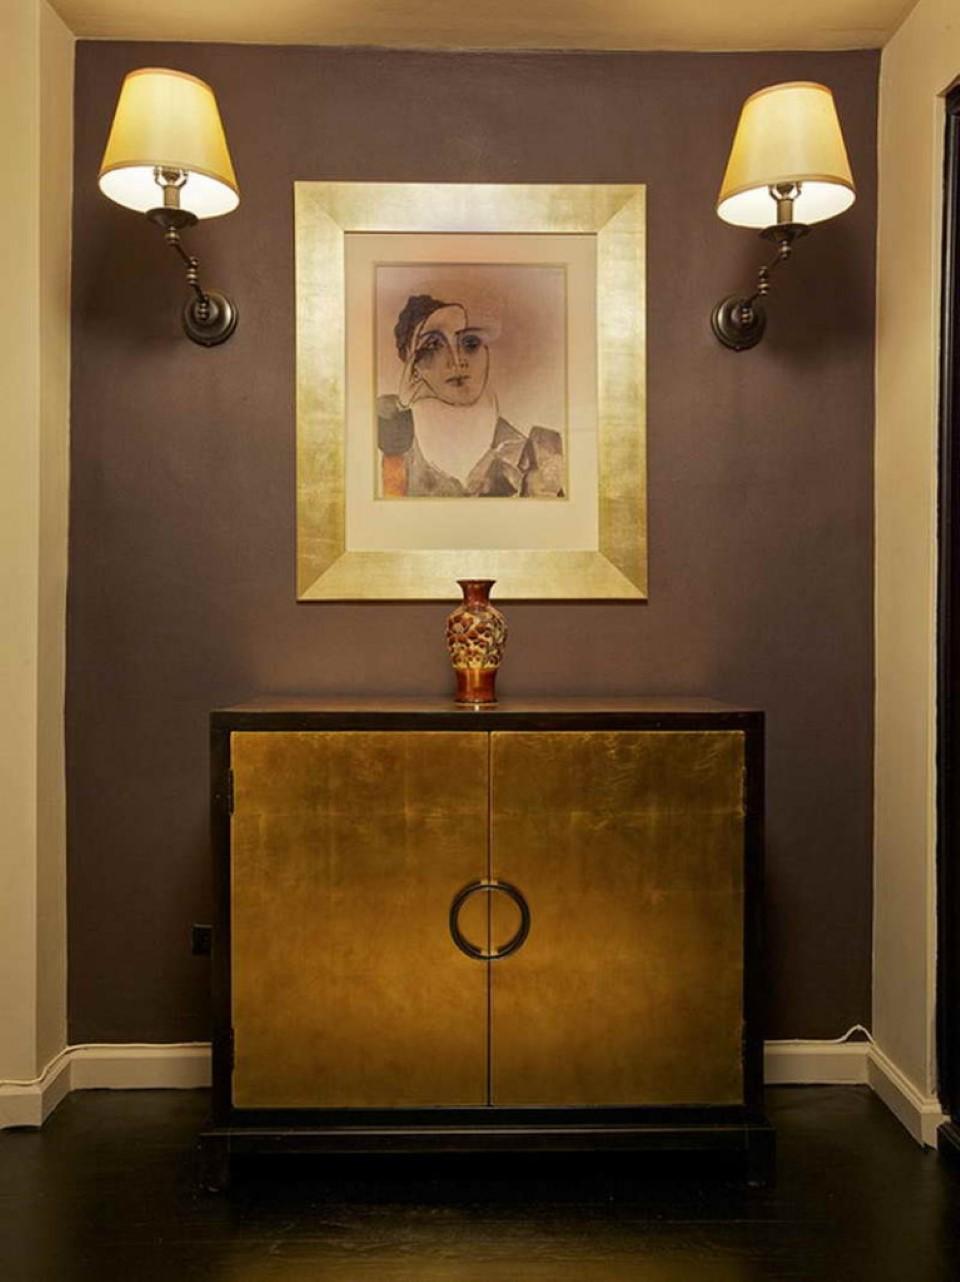 Best Foyer Design : Best foyer design the sensation of great waiting time